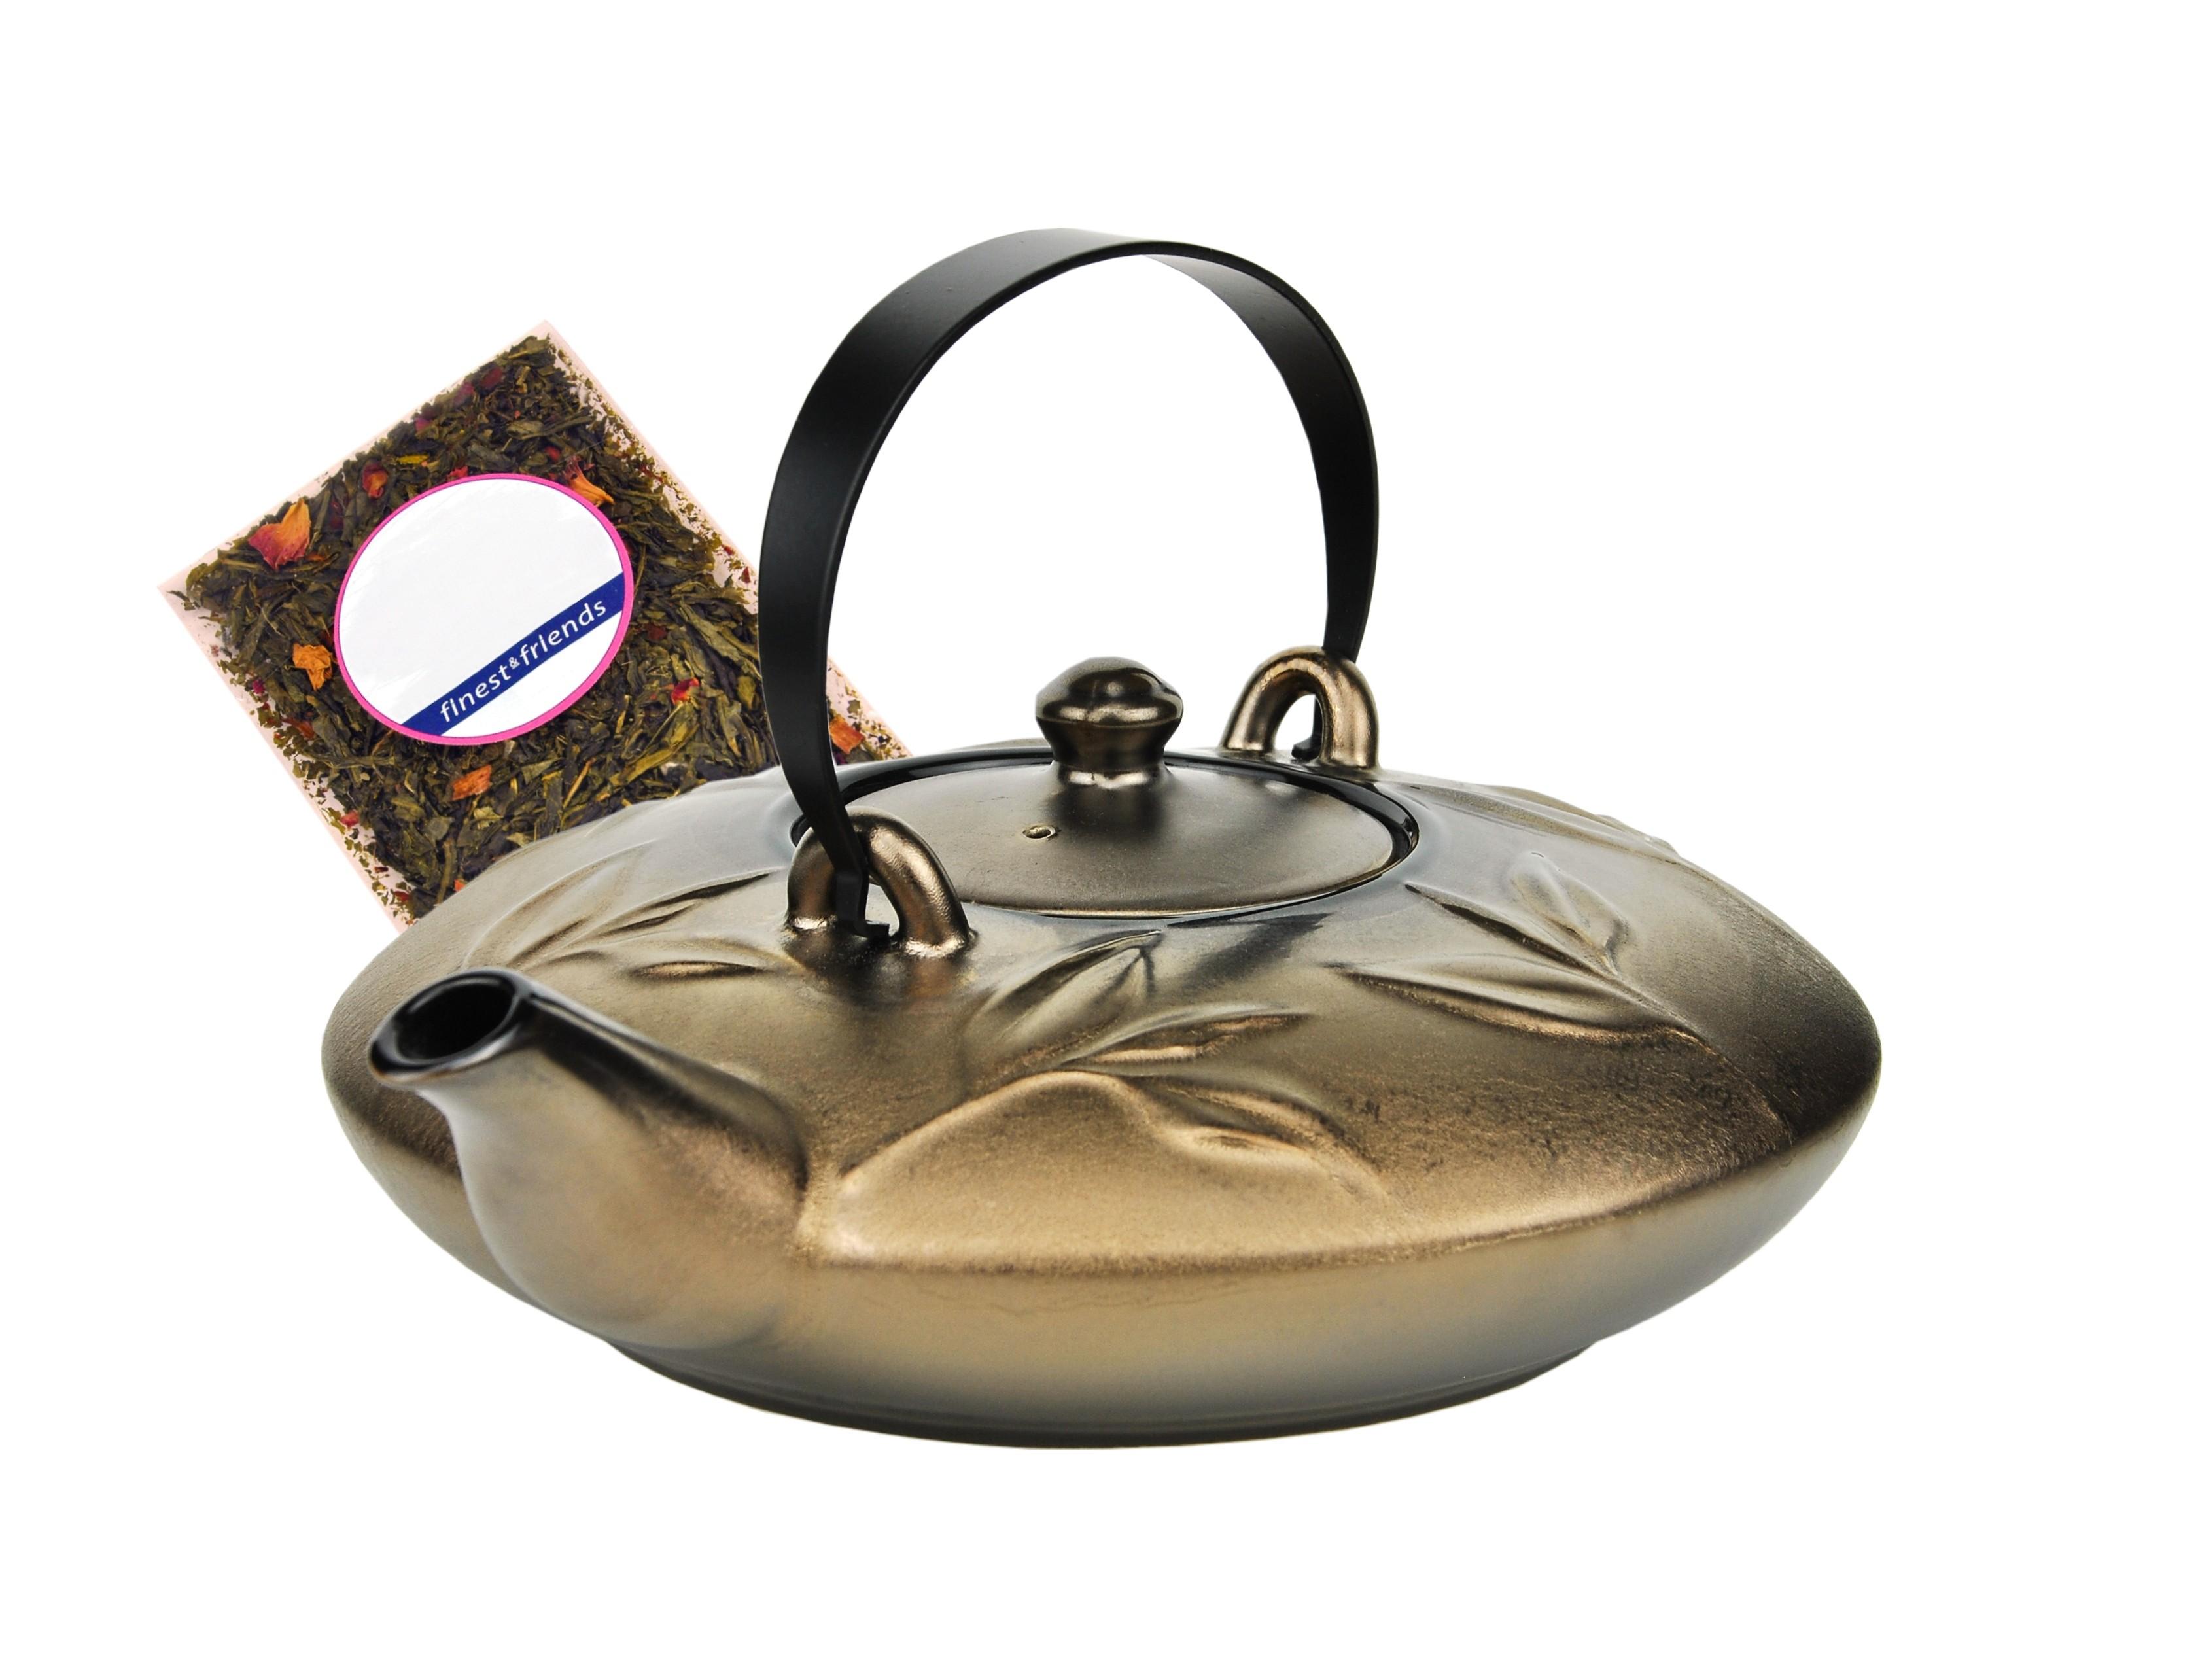 japanische teekanne keramik kyoto mit metallhenkel 0 7l. Black Bedroom Furniture Sets. Home Design Ideas